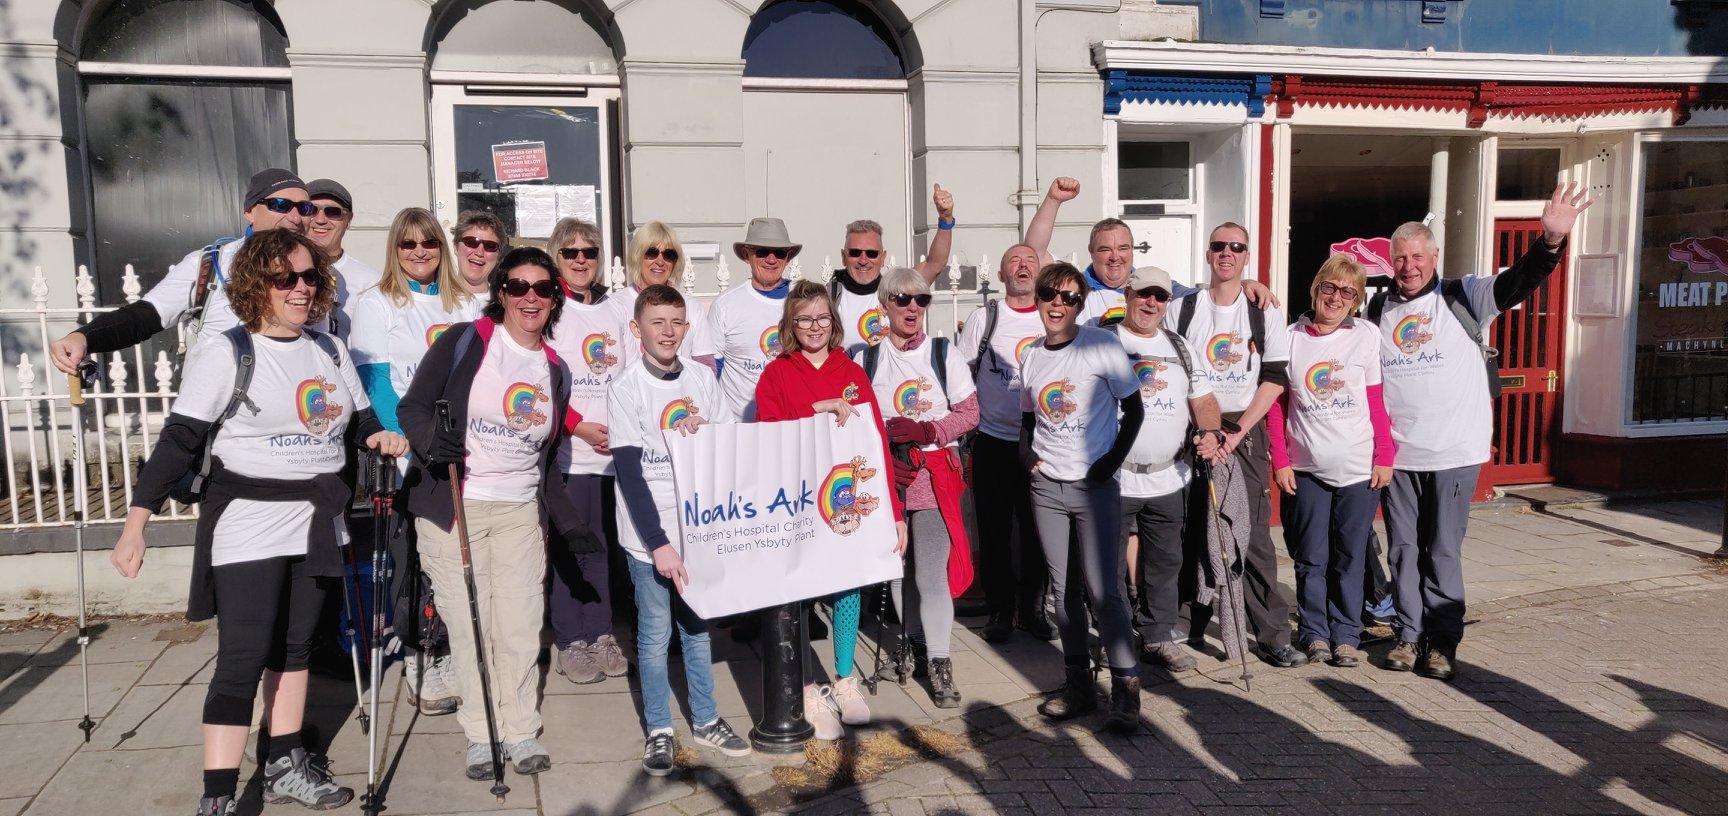 Noahs Ark Charity Team